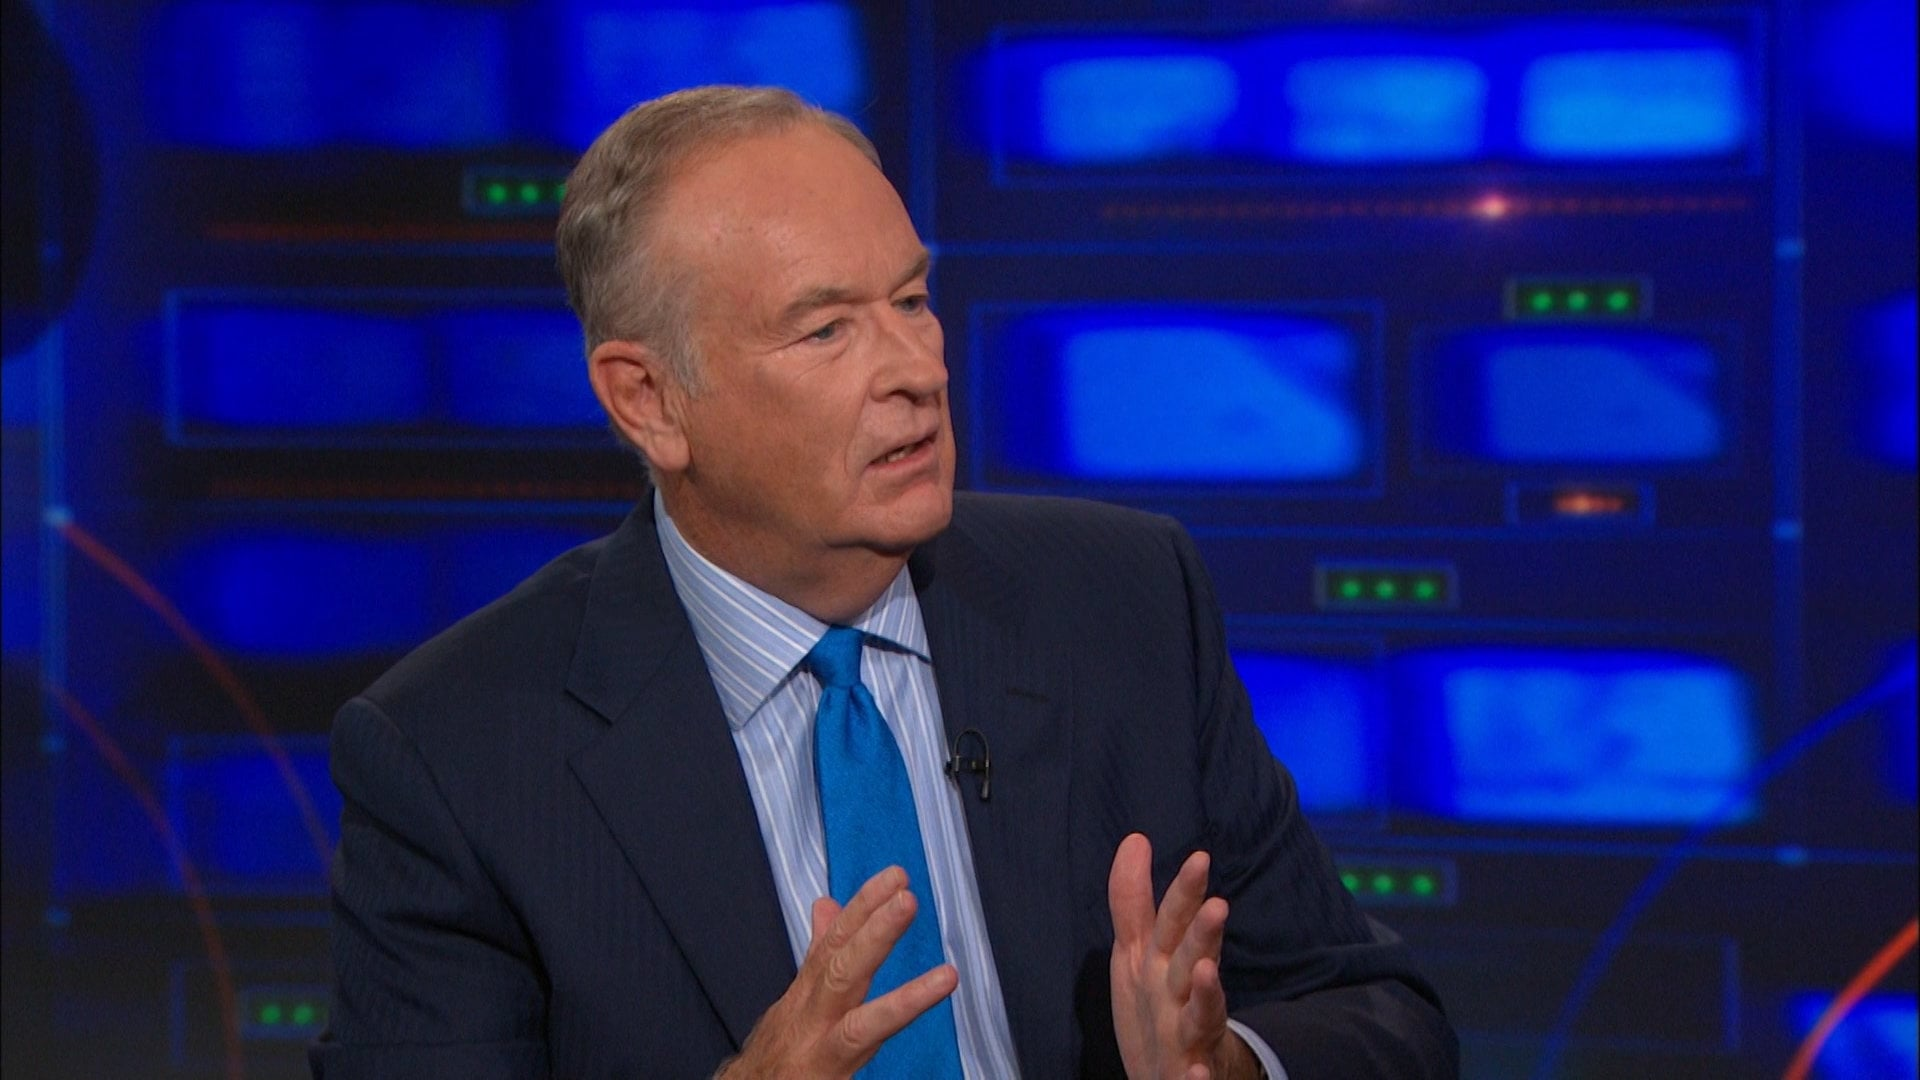 The Daily Show with Trevor Noah Season 20 :Episode 11  Bill O'Reilly